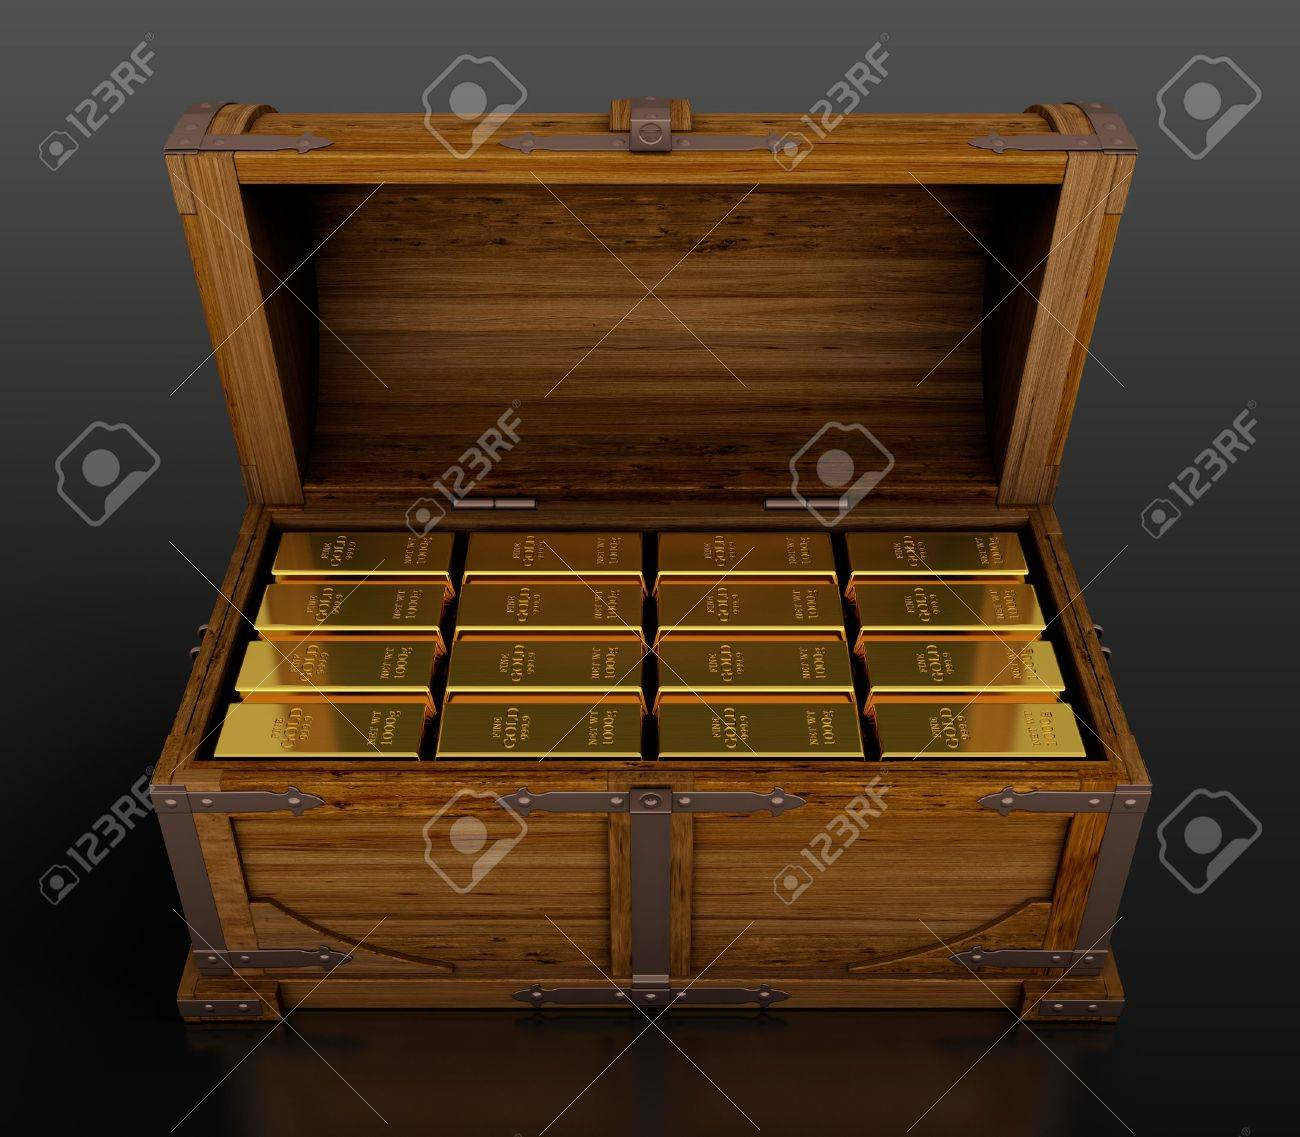 treasure chest full of gold bars on black background stock photo